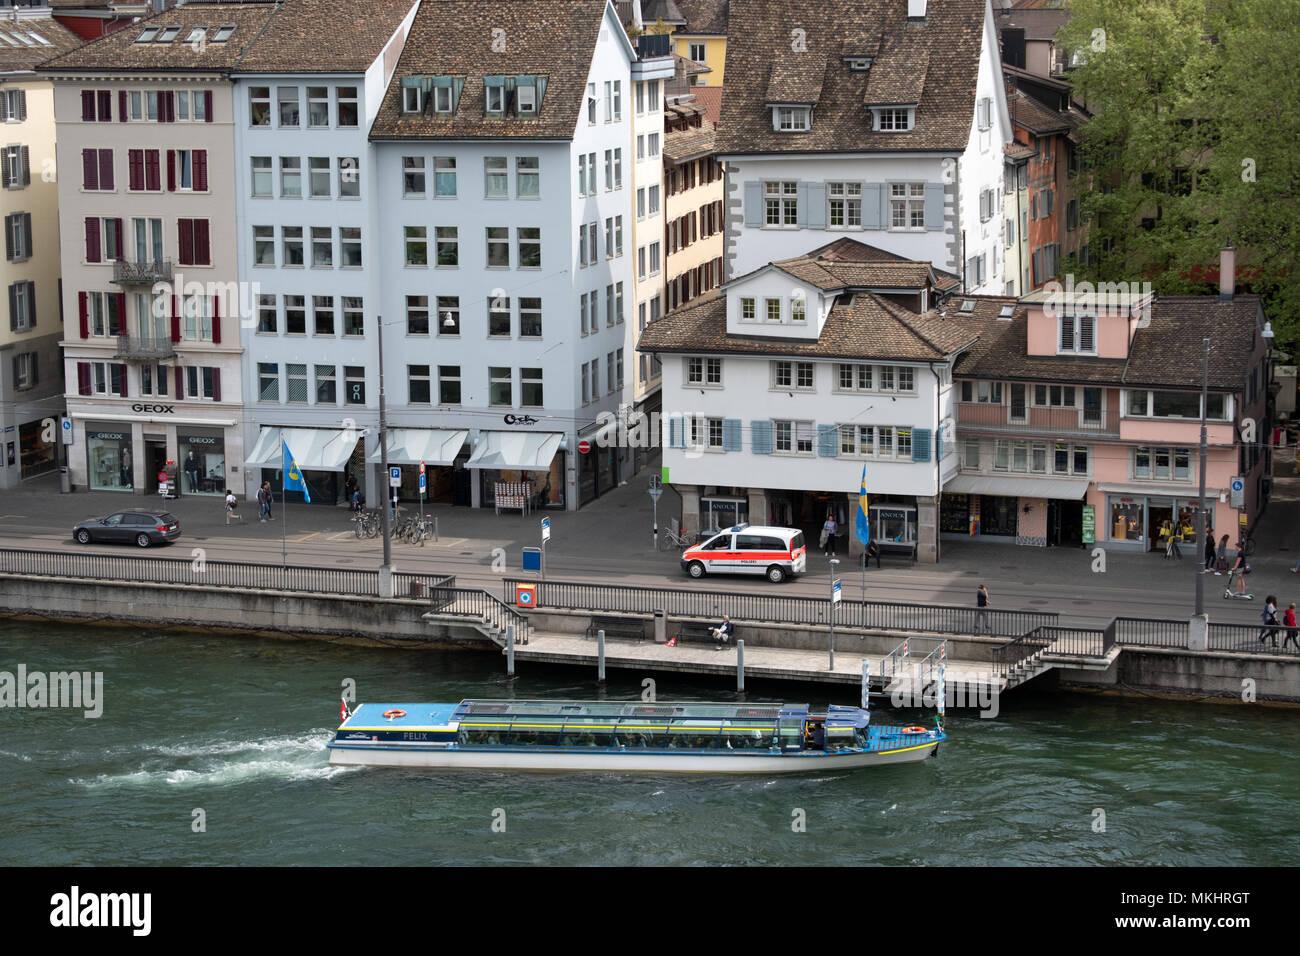 Elevated view of the Zurich skyline from the Lindenhof hill, Zurich, Switzerland, Europe - Stock Image